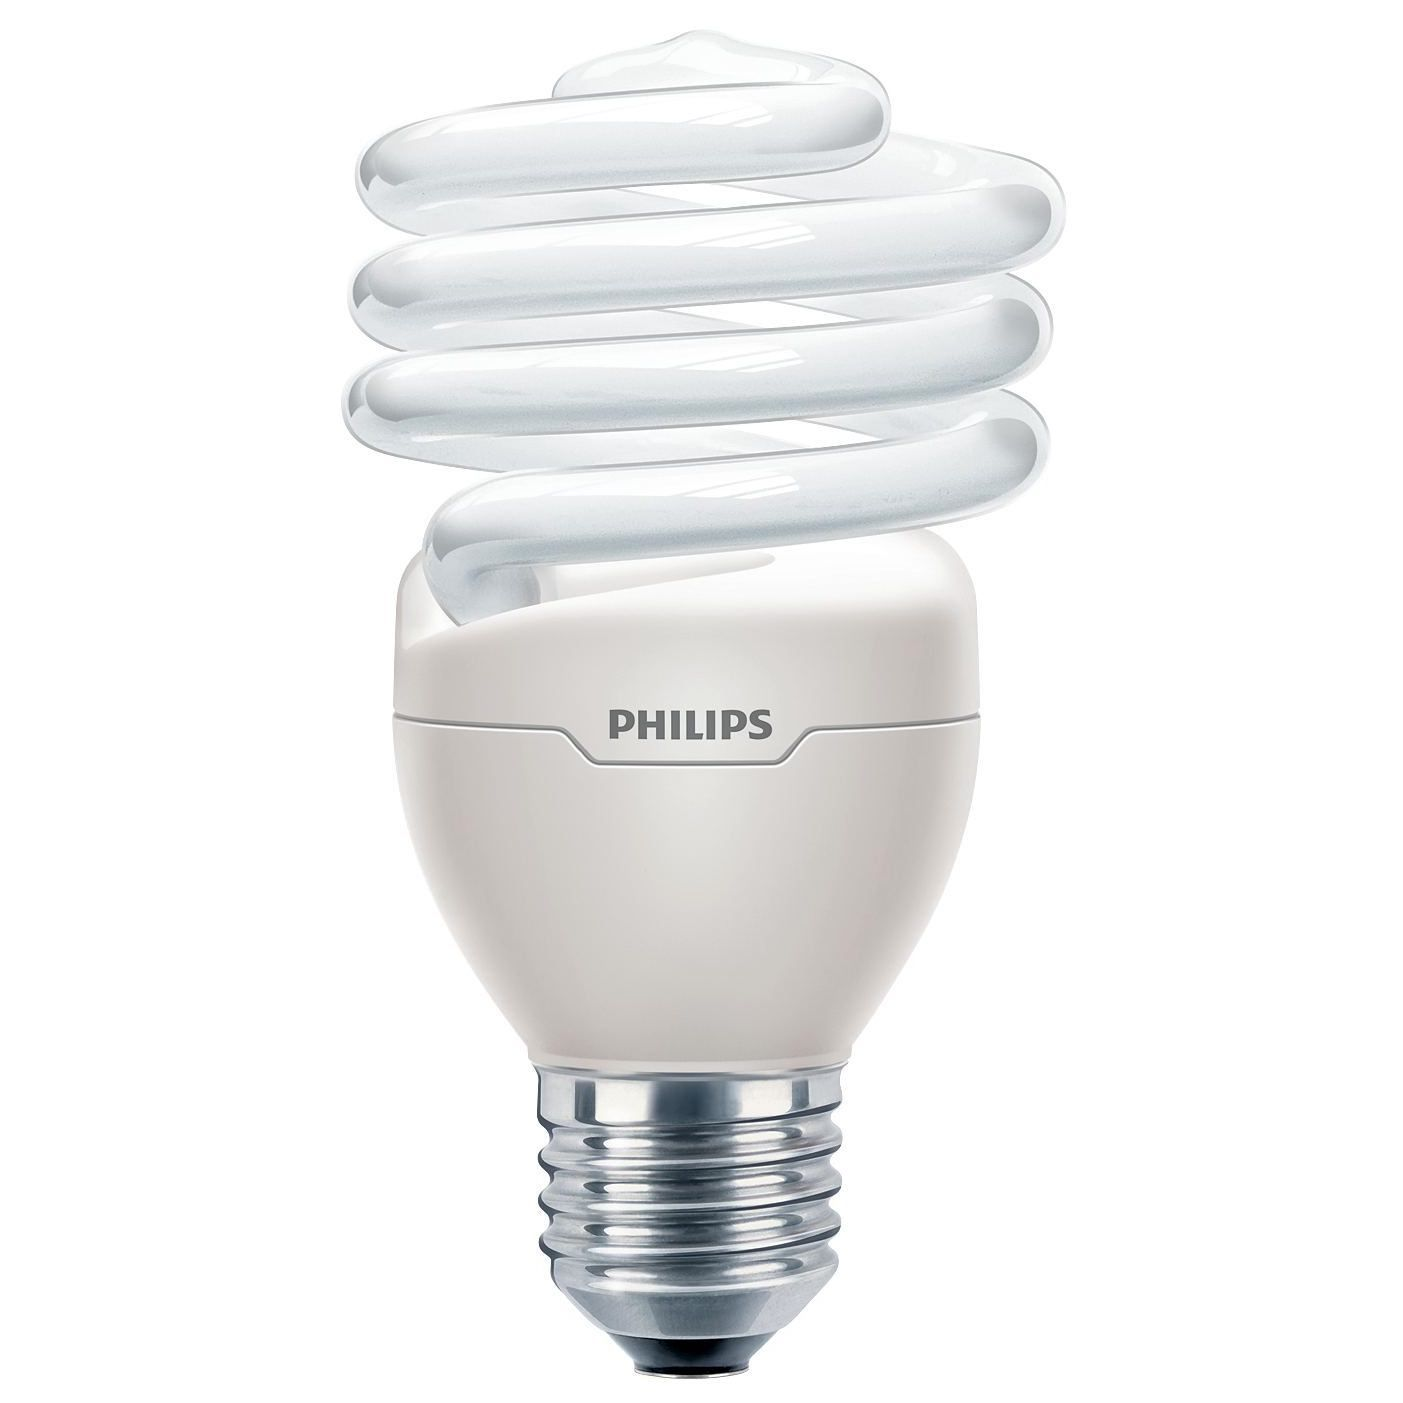 Купить Лампа люминесцентная Philips Tornado T2 8y 23W WW E27 220-240V 1CT/12 8000ч тепл